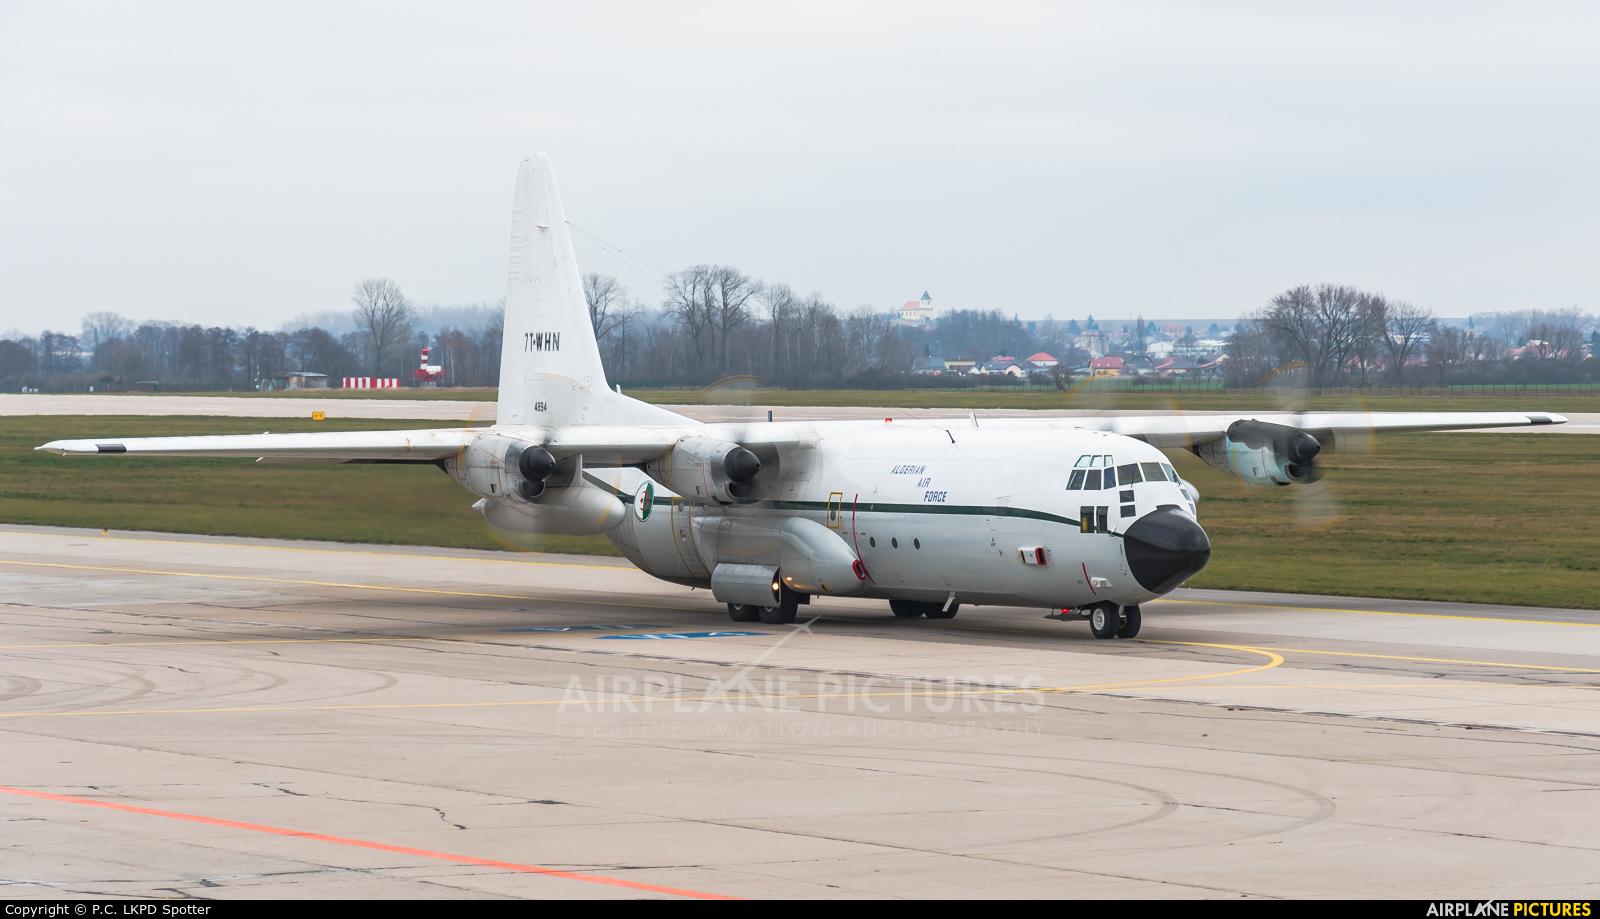 Algeria - Air Force 7T-WHN aircraft at Pardubice